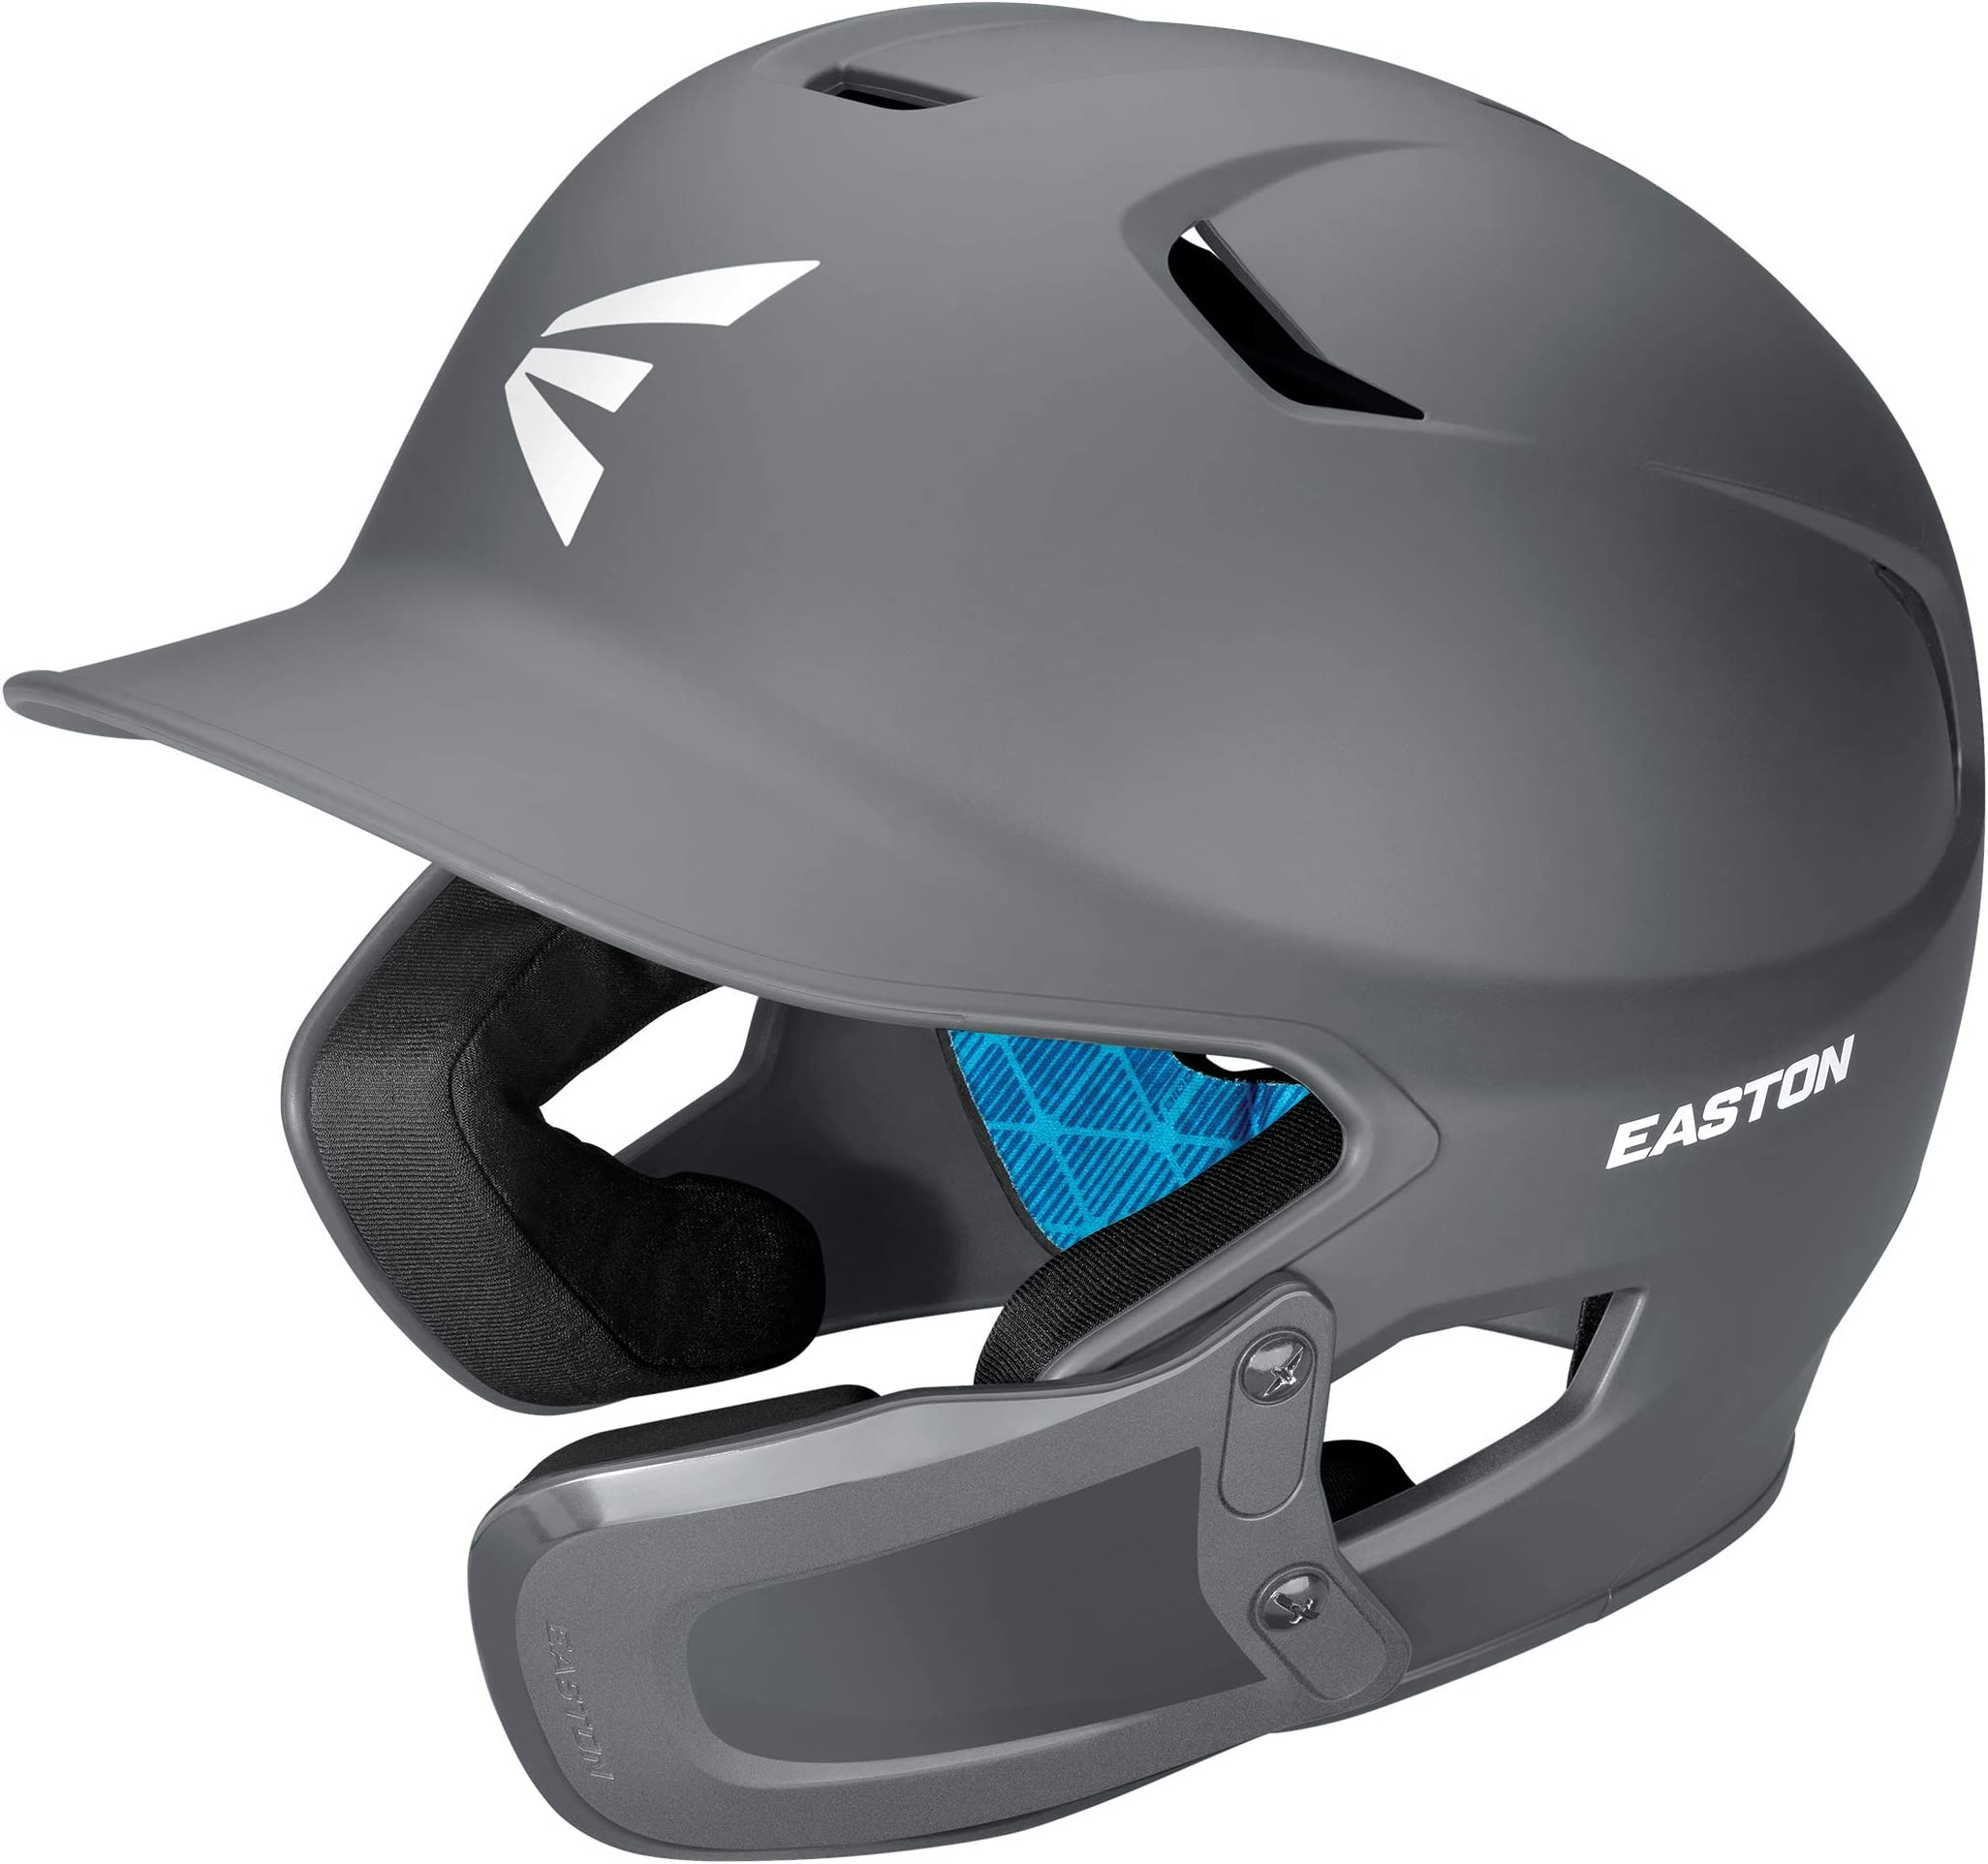 EASTON Z5 2.0 Batting Helmet w/Universal Jaw Guard, Baseball Softball, 2021, Matte Color, Dual-Density Impact Absorption Foam, Moisture Wicking BioDRI Liner, Fits Left or Right Handed Batters